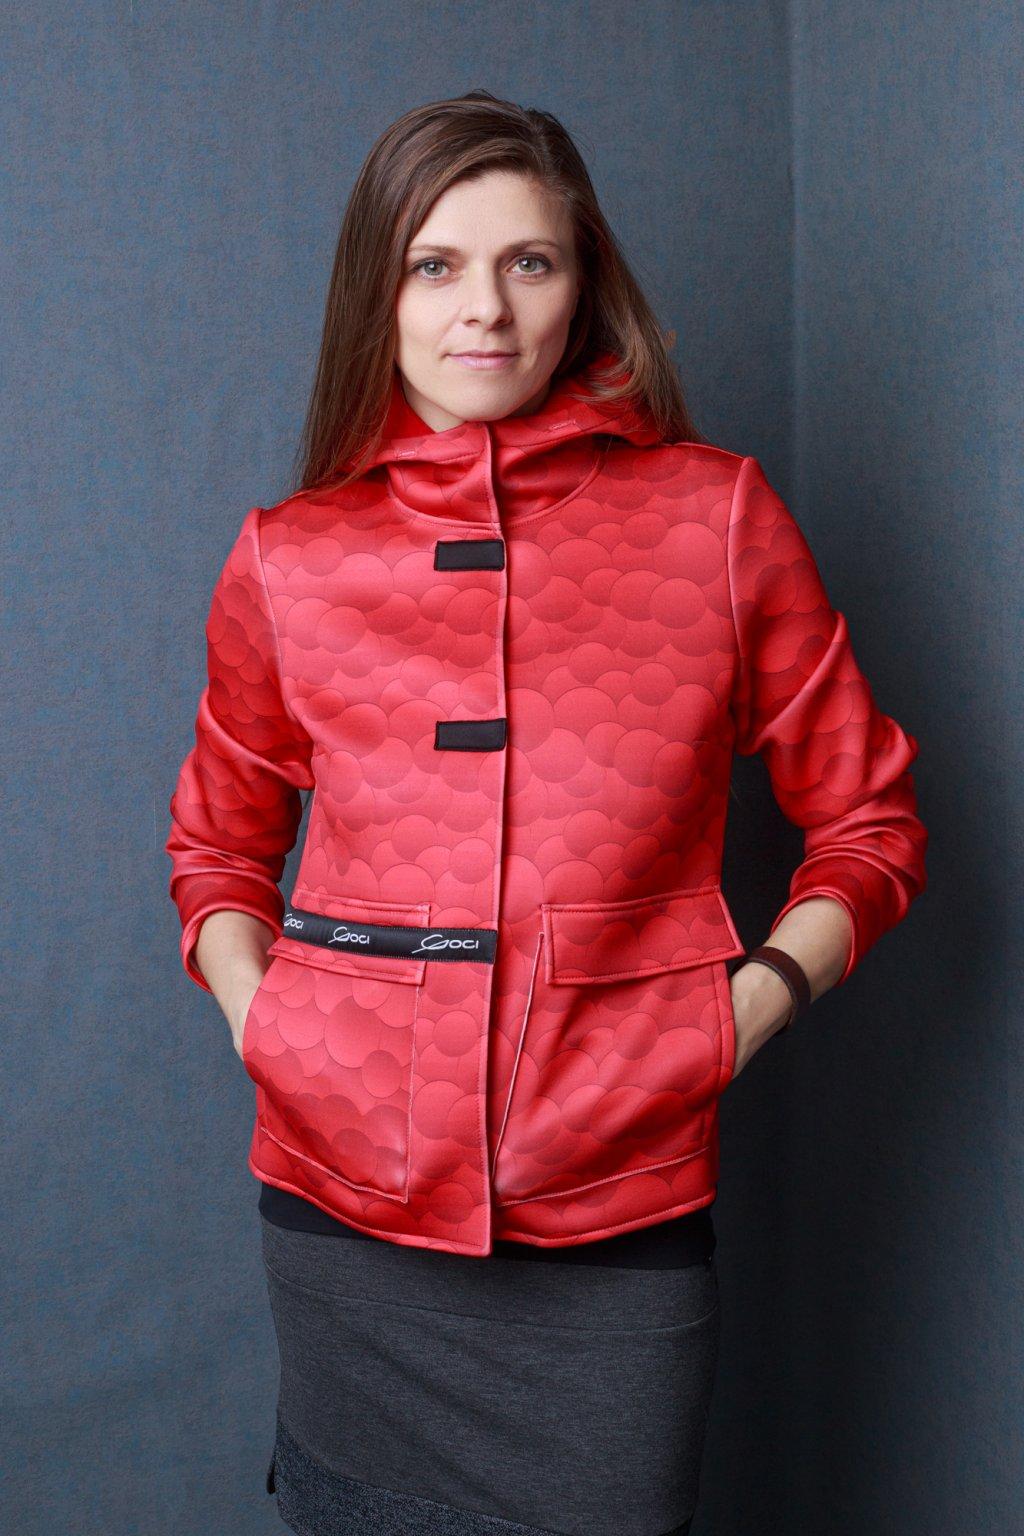 Bundička červená (4)